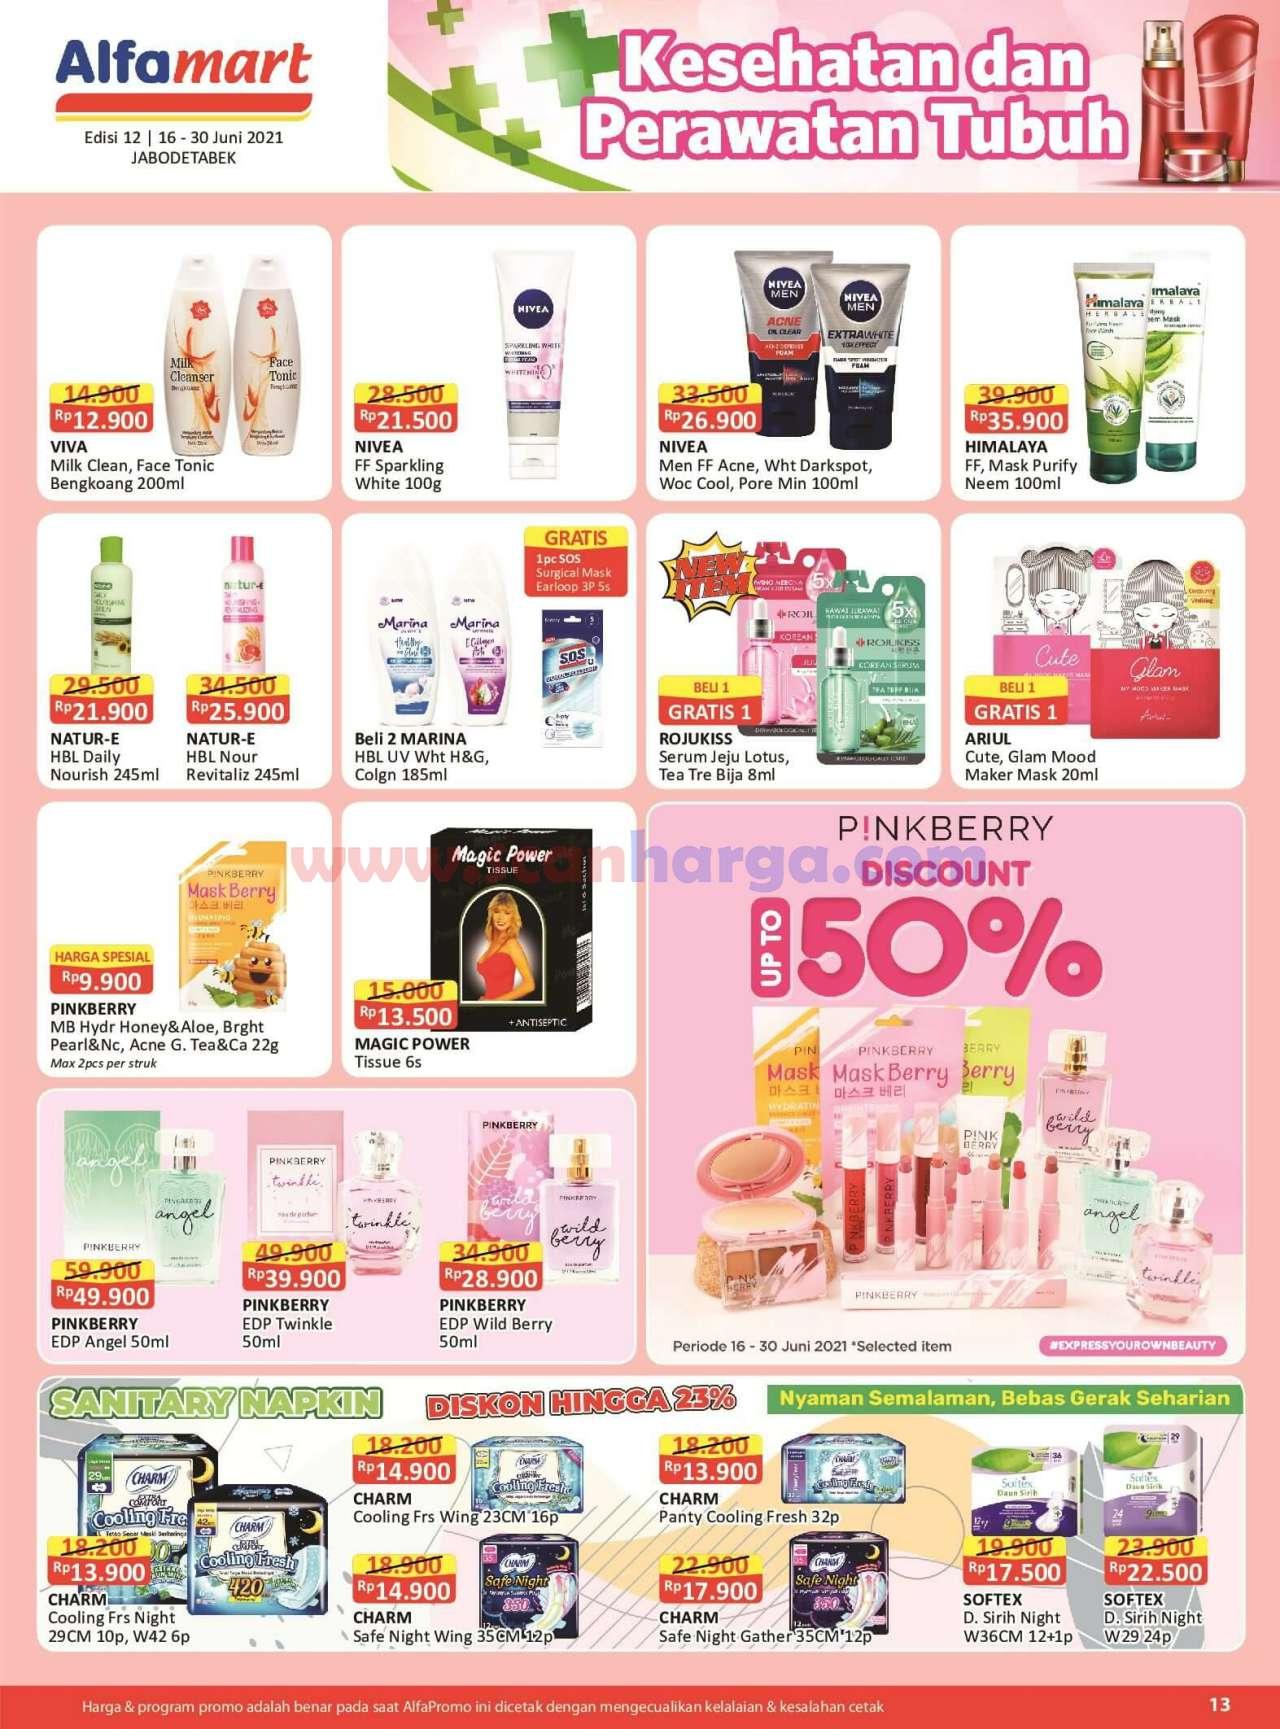 Katalog Promo Alfamart 16 - 30 Juni 2021 13